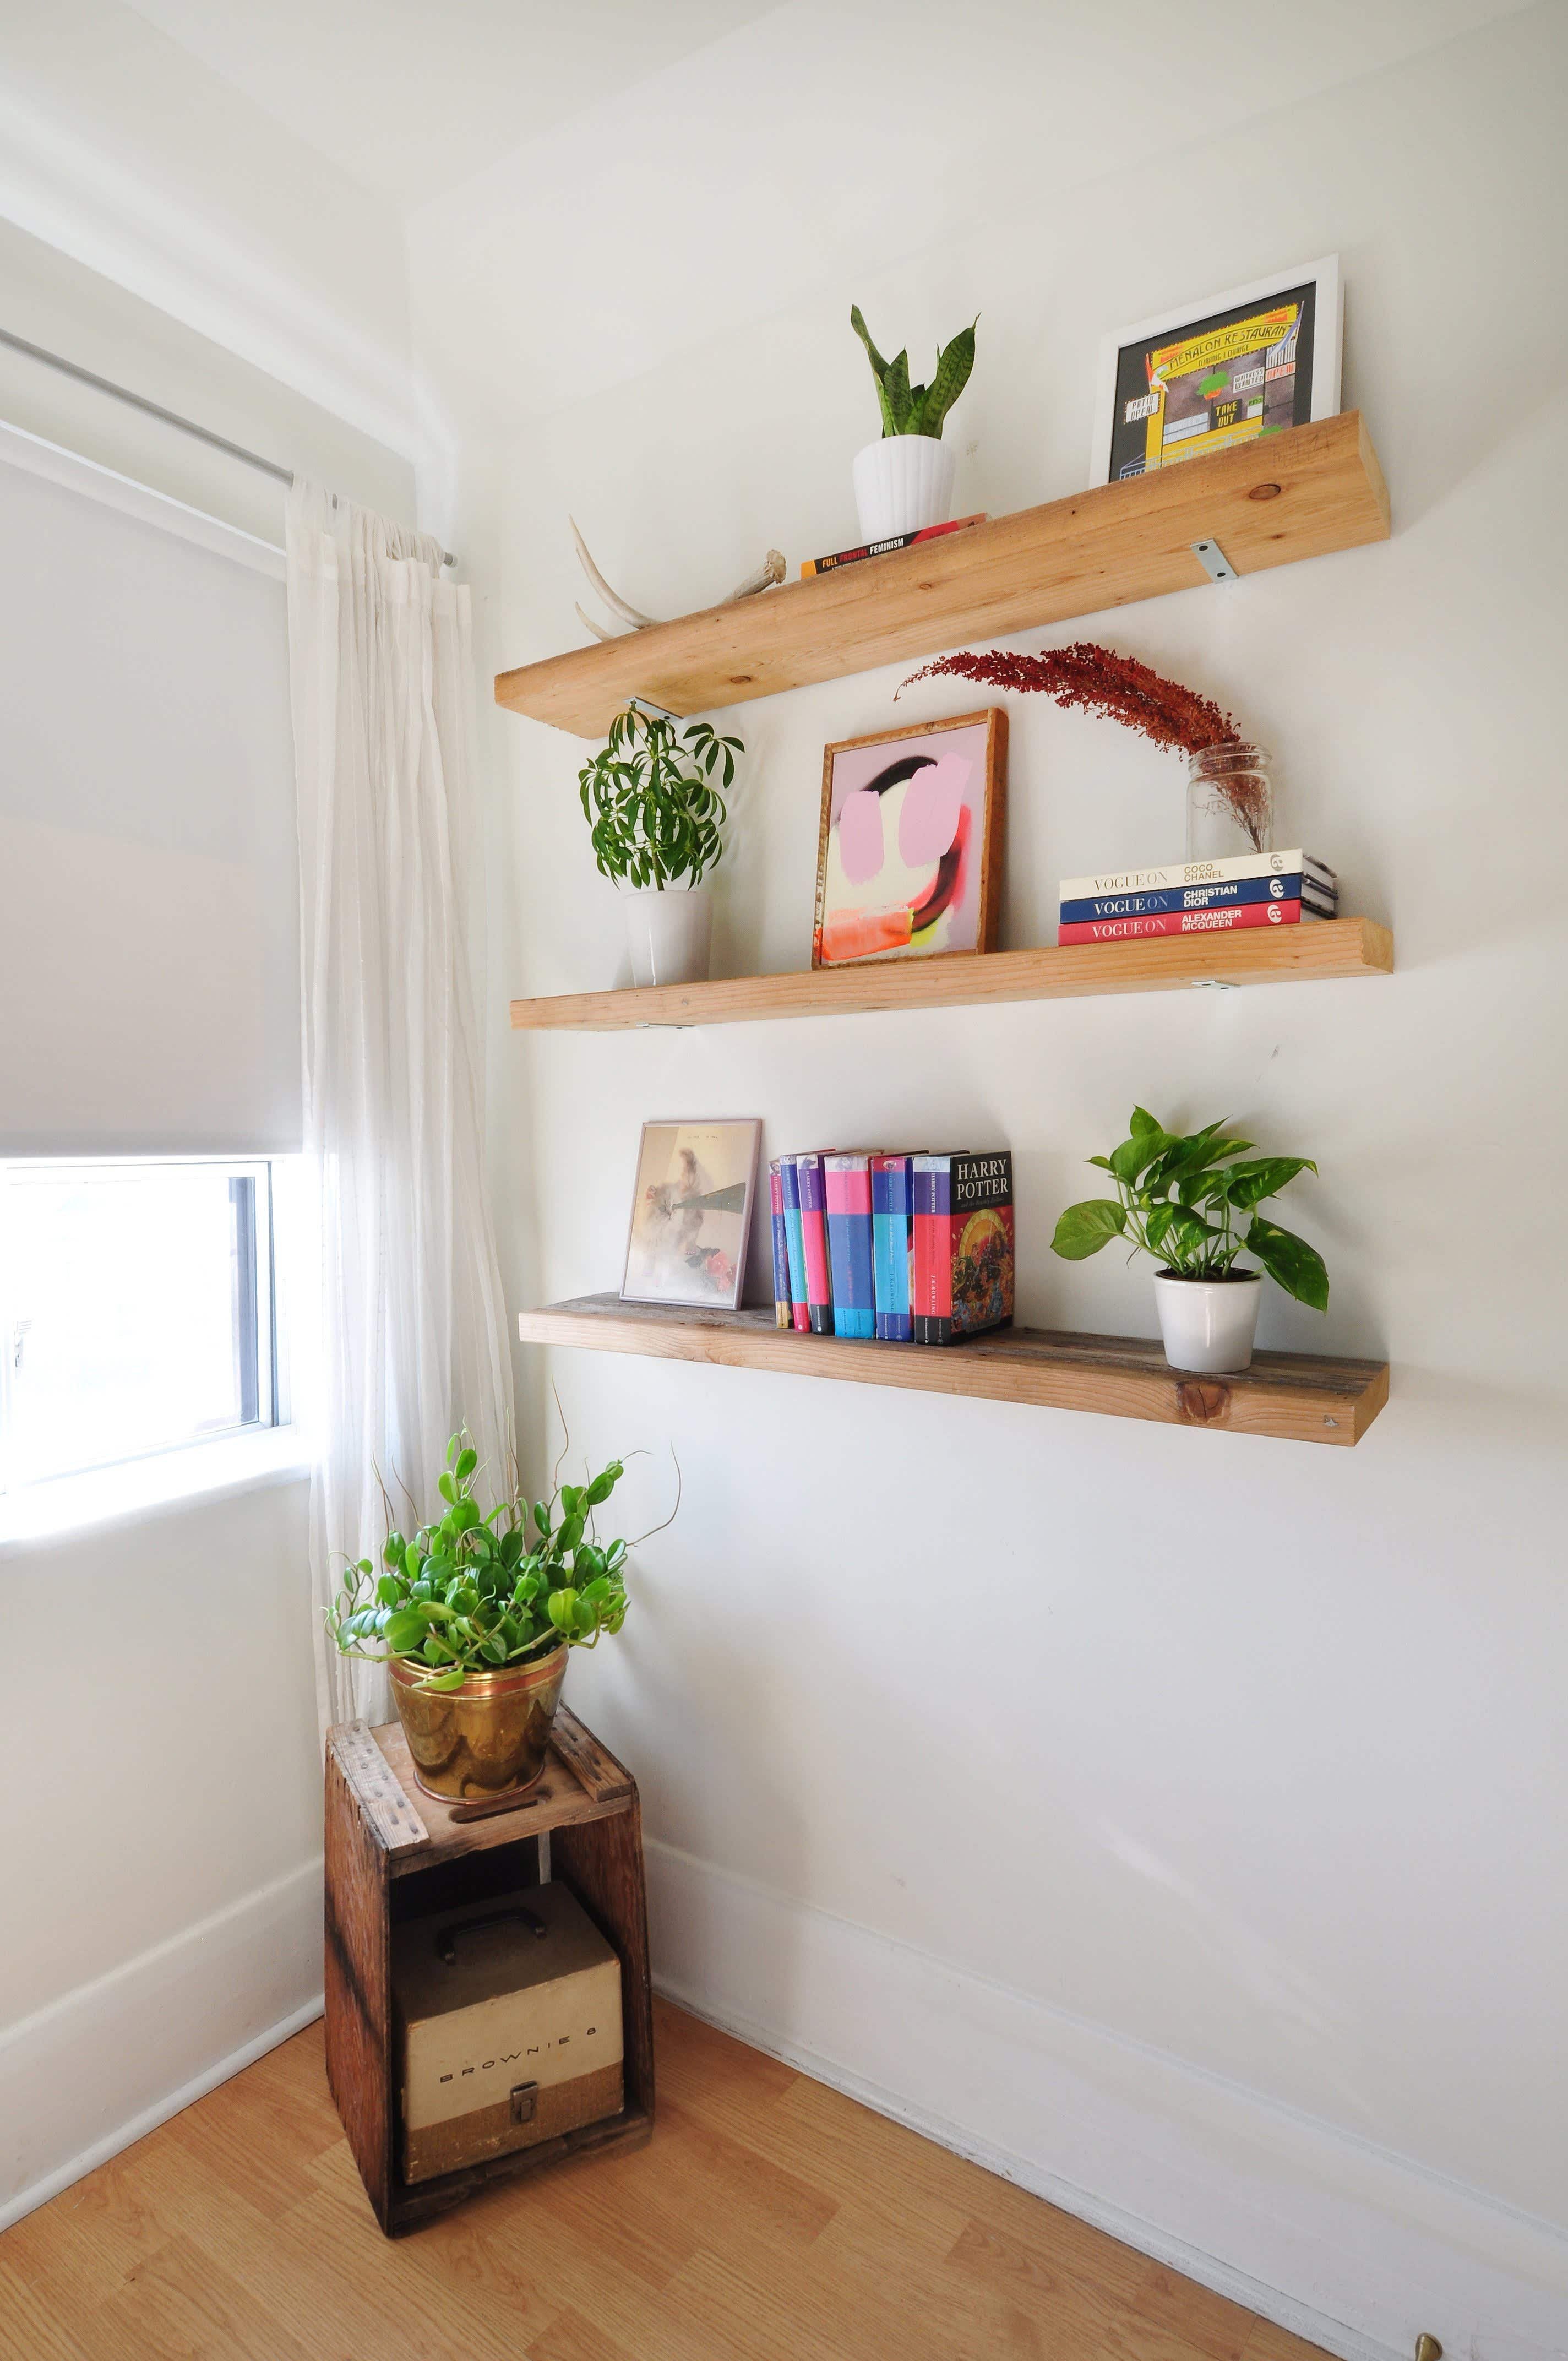 Meg & Justin's Art, Plants & Friendly VibesFilled